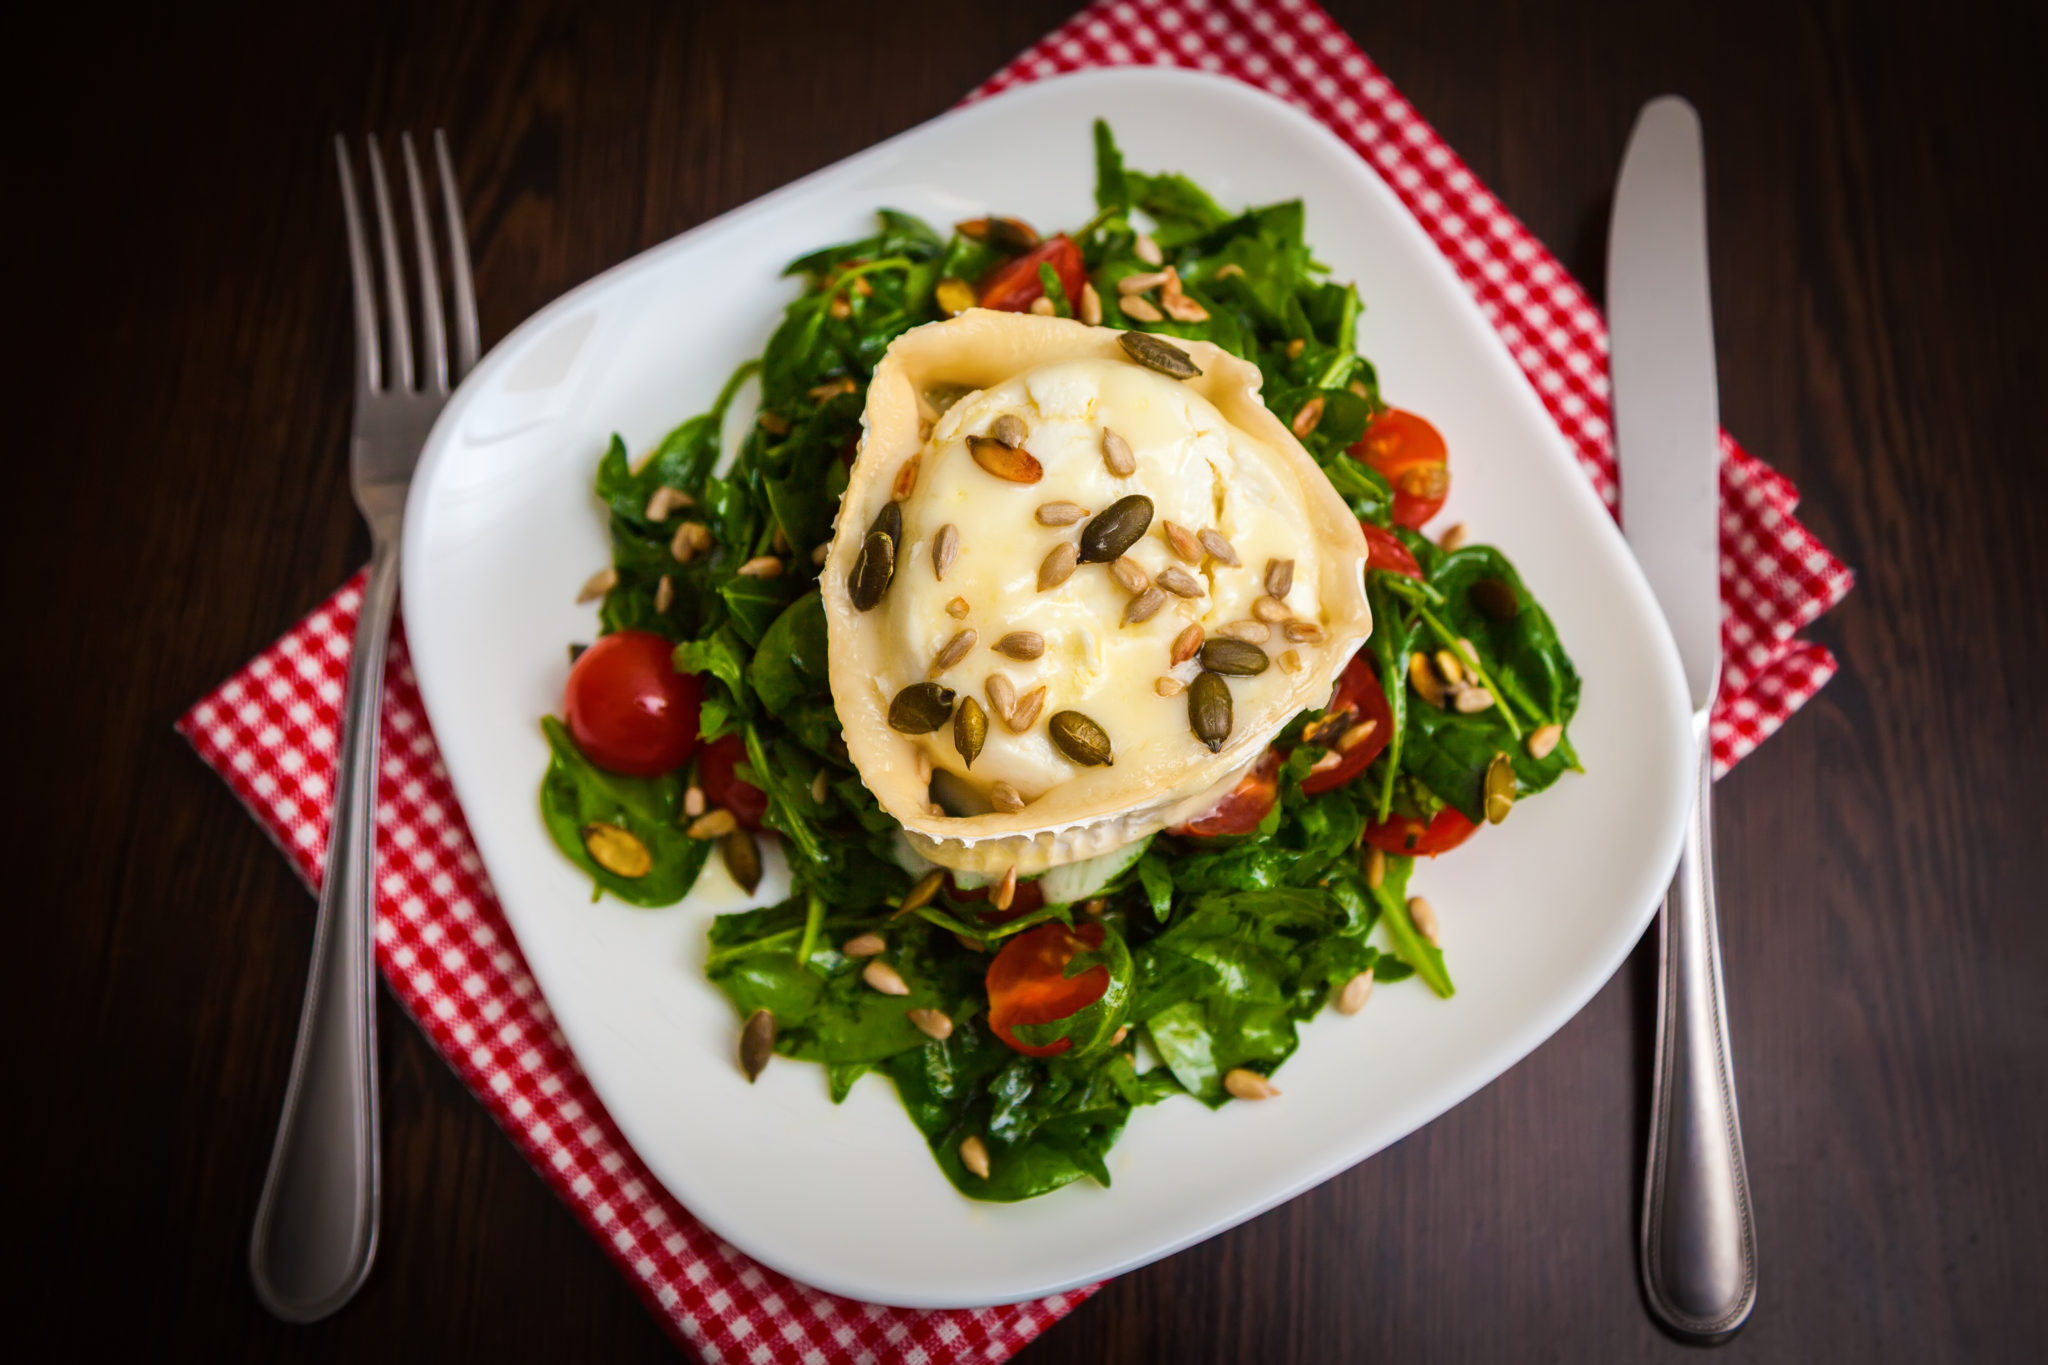 Crottin Salad with Grilled Paglierino Recipe